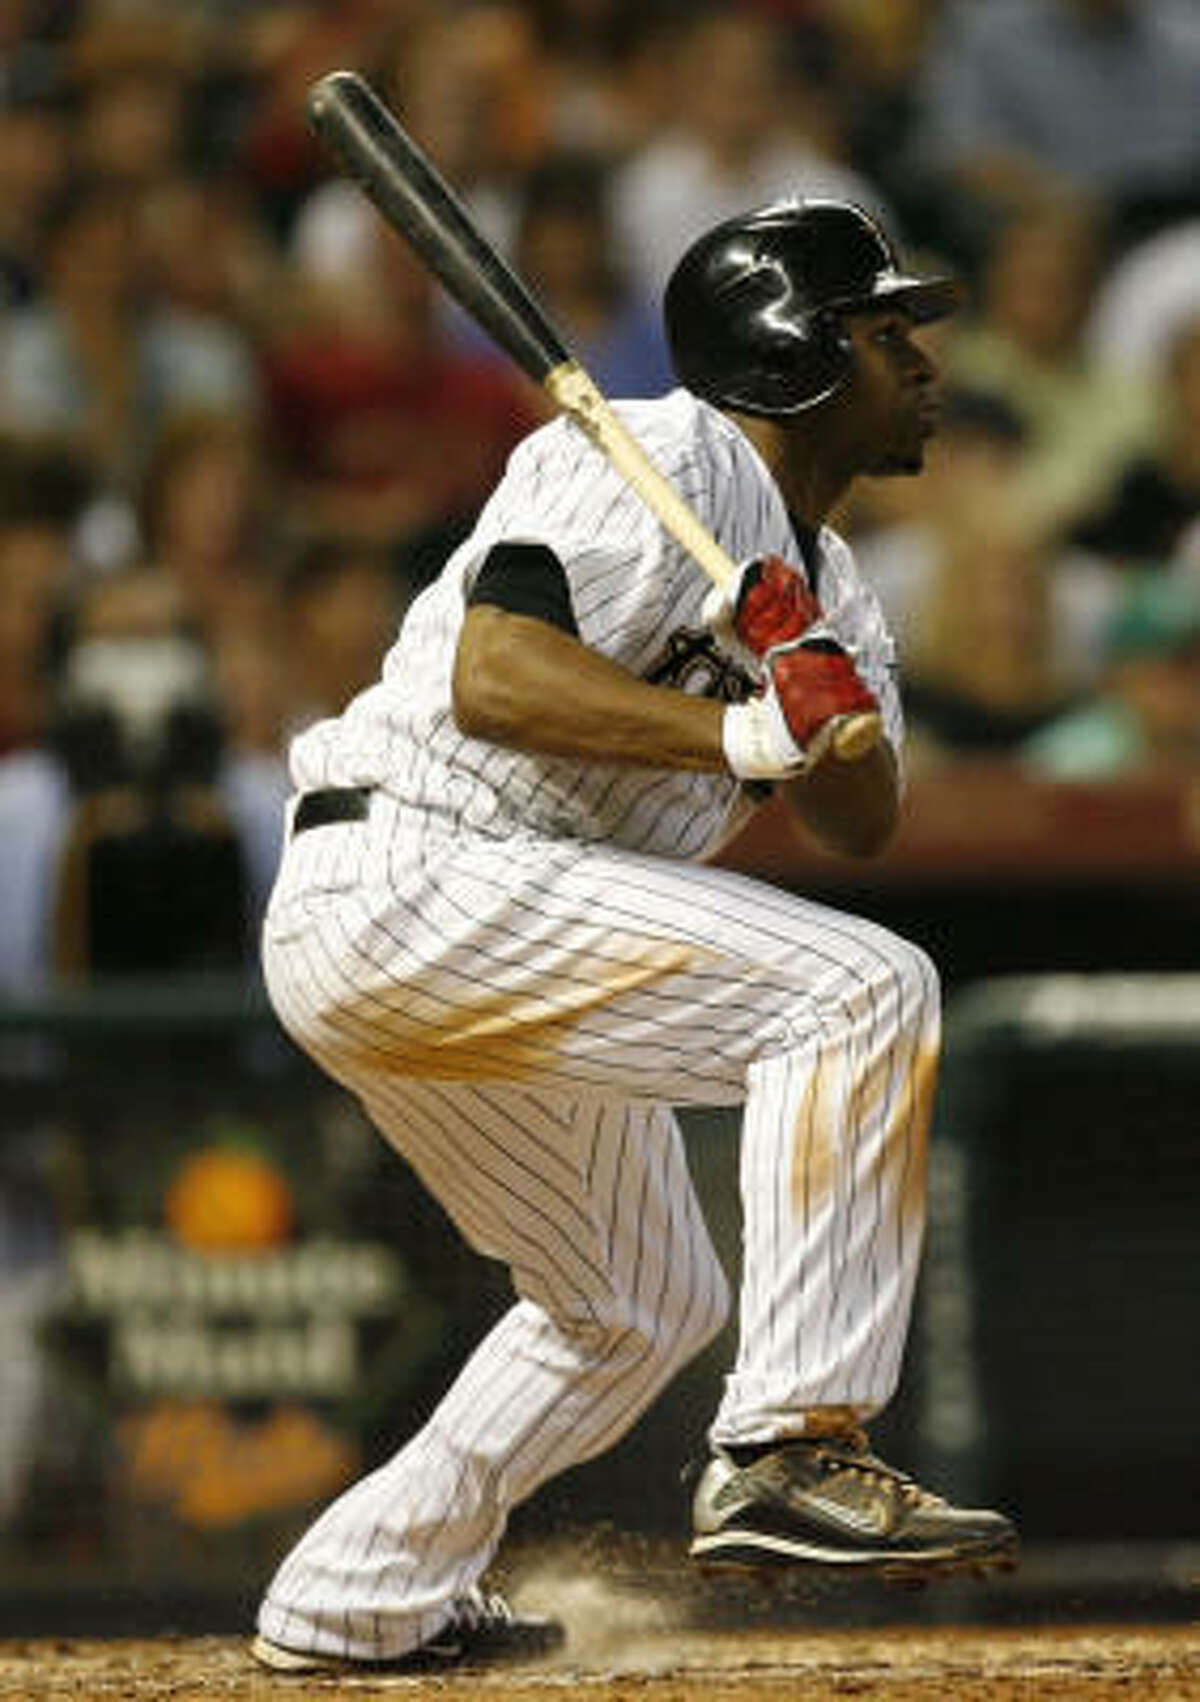 1. Michael Bourn, CF 2009 stats: .285 batting average, 3 HRs, 35 RBI, .354 on-base percentage